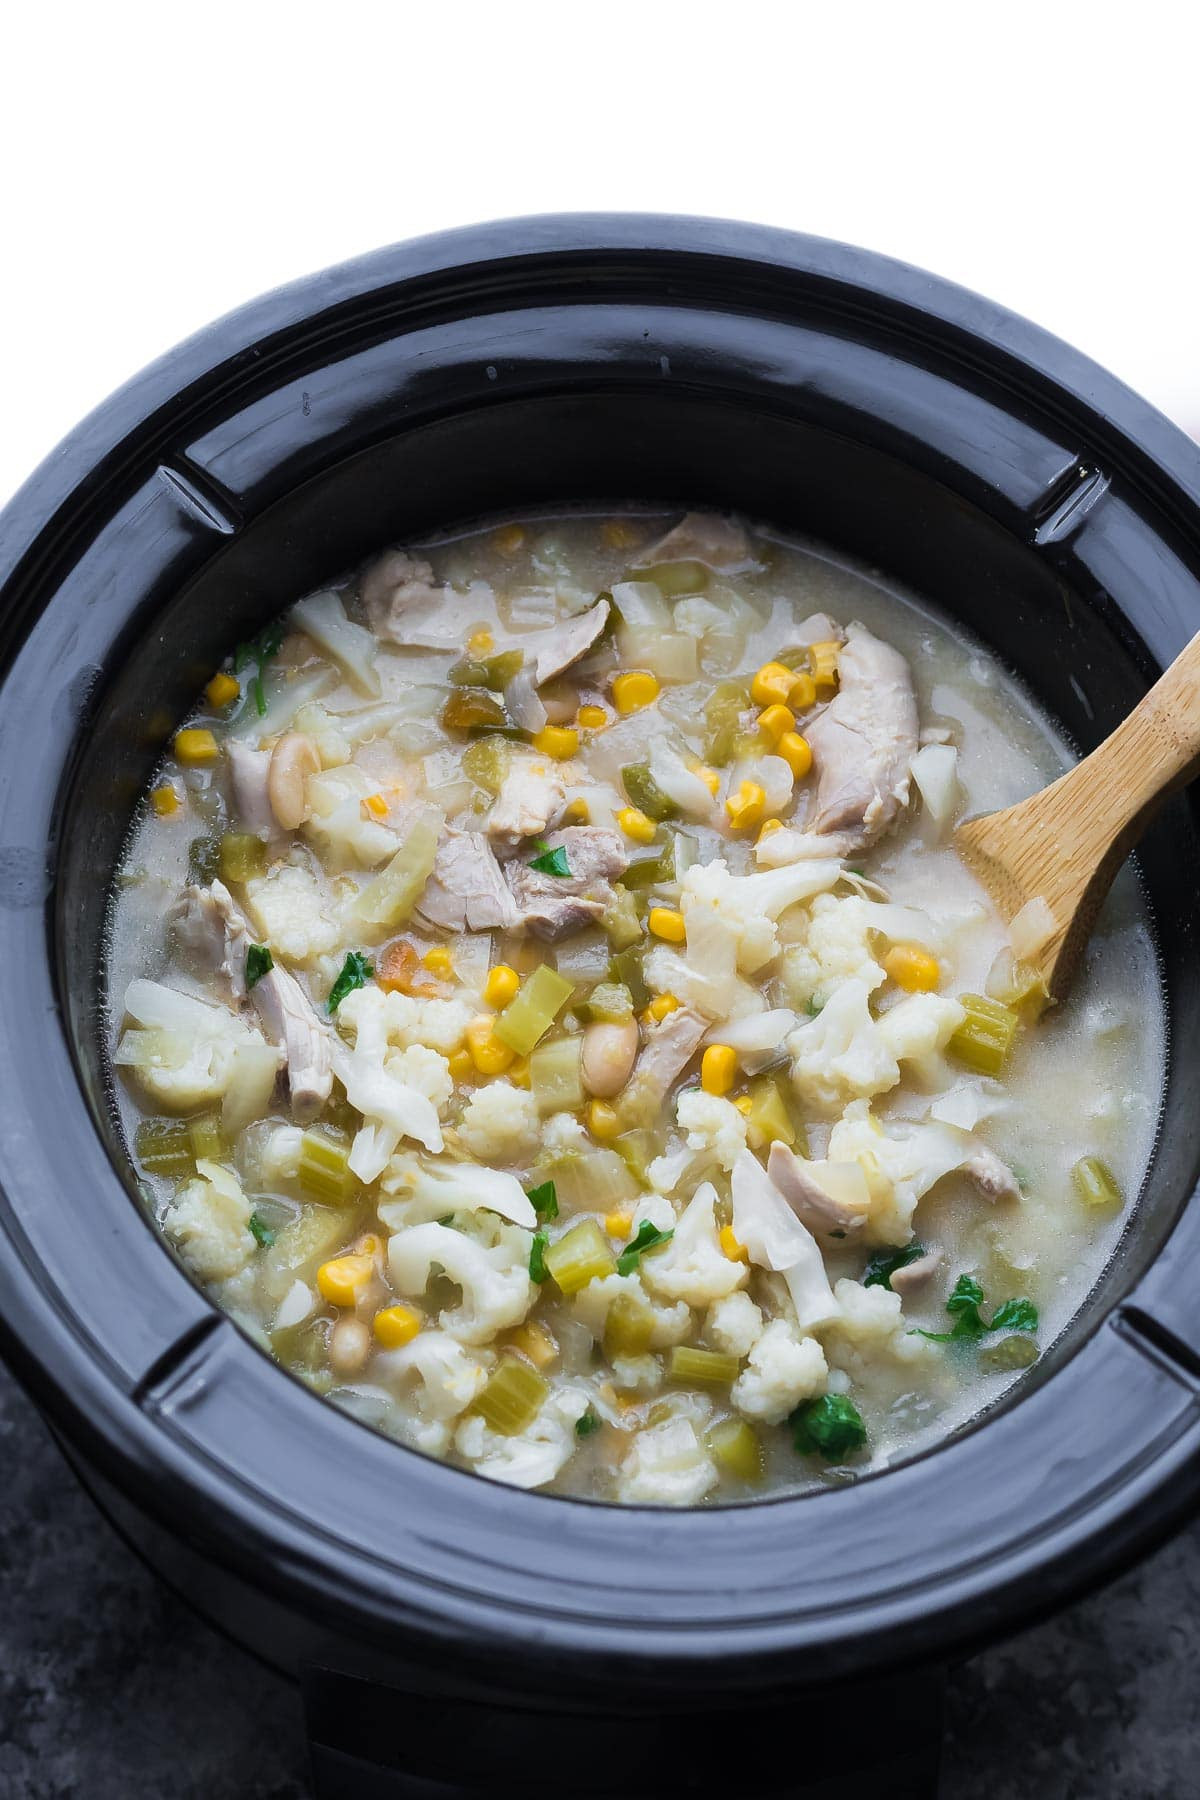 Healthy Chicken Chili Crock Pot  Healthy Slow Cooker White Chicken Chili Freezer to Crock